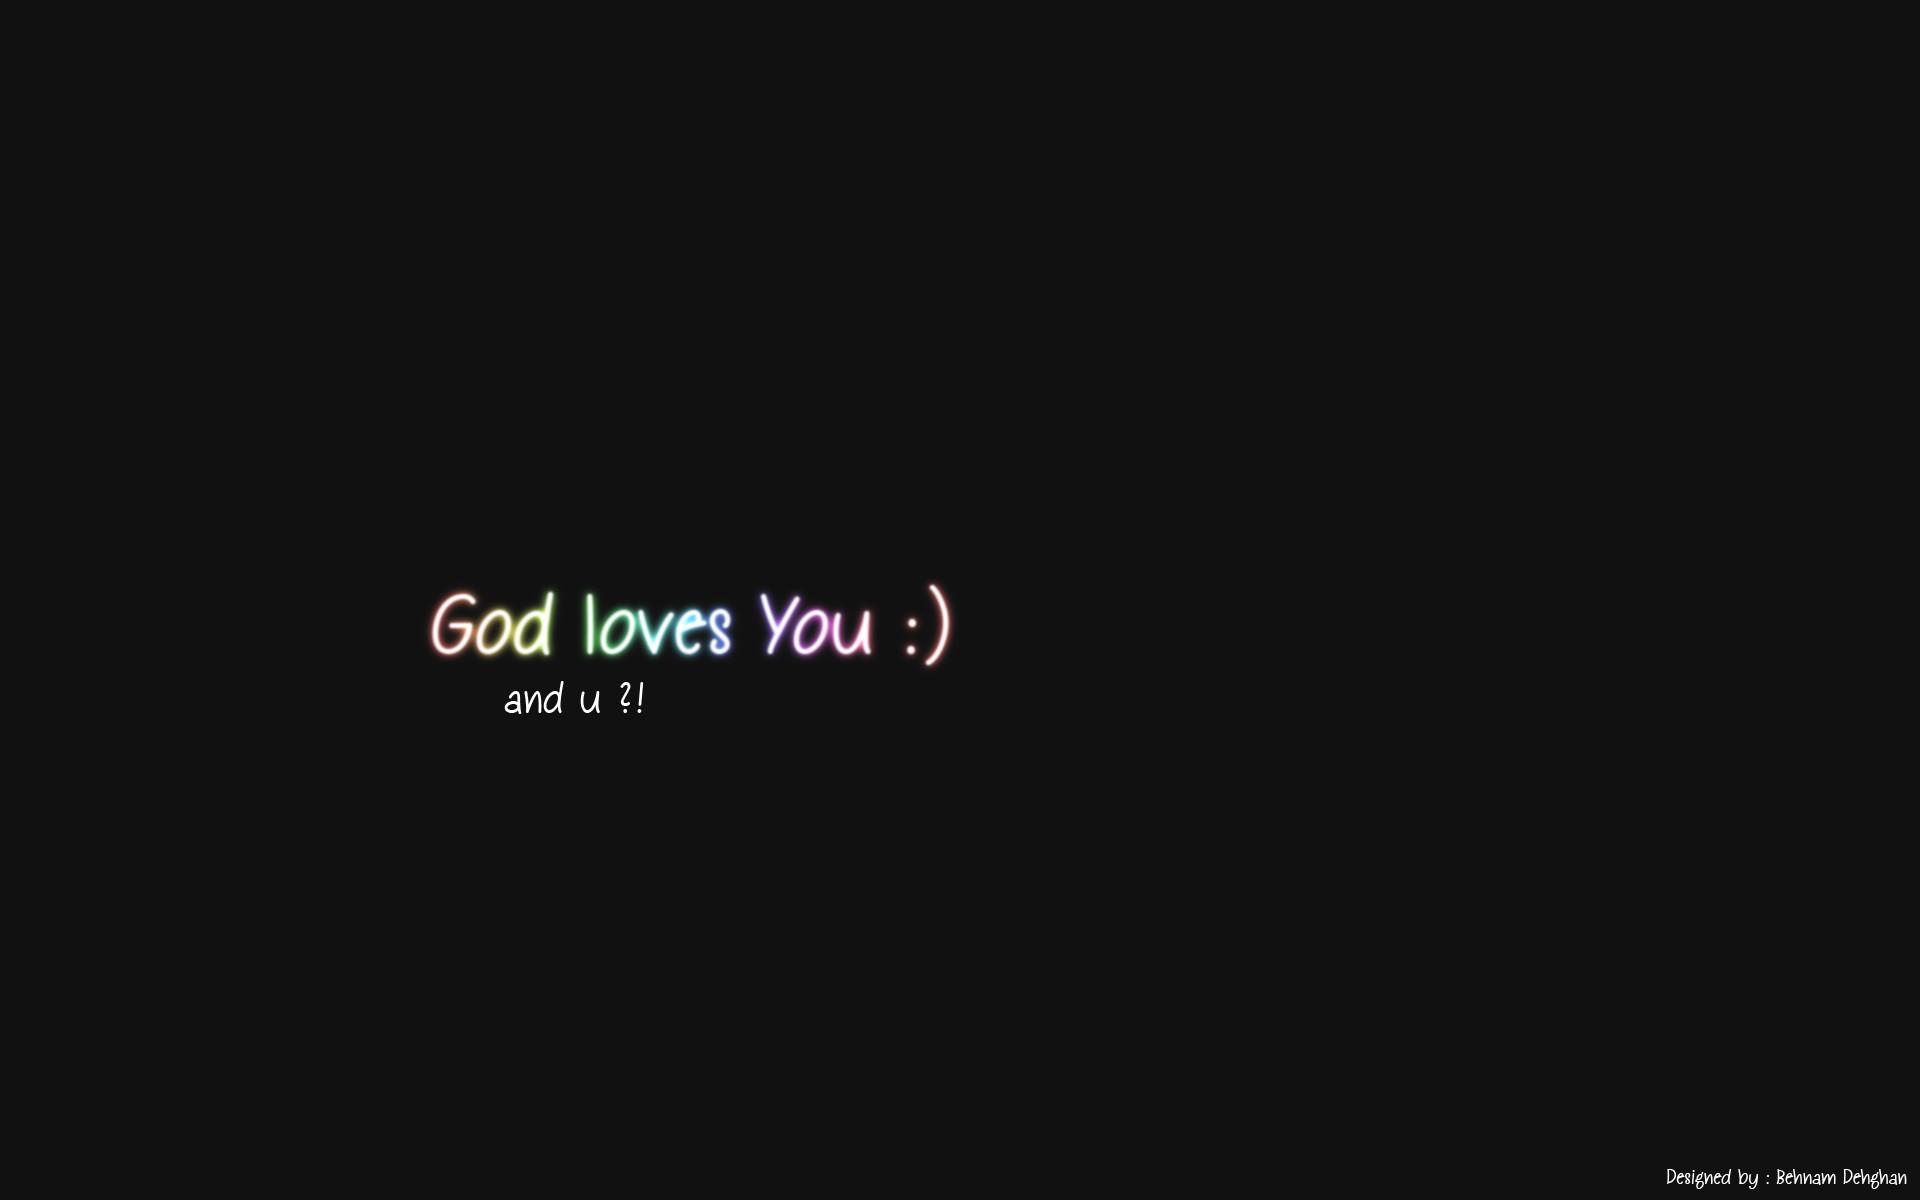 God Is Love Wallpaper Hd : God Is Love Wallpaper (63+ images)